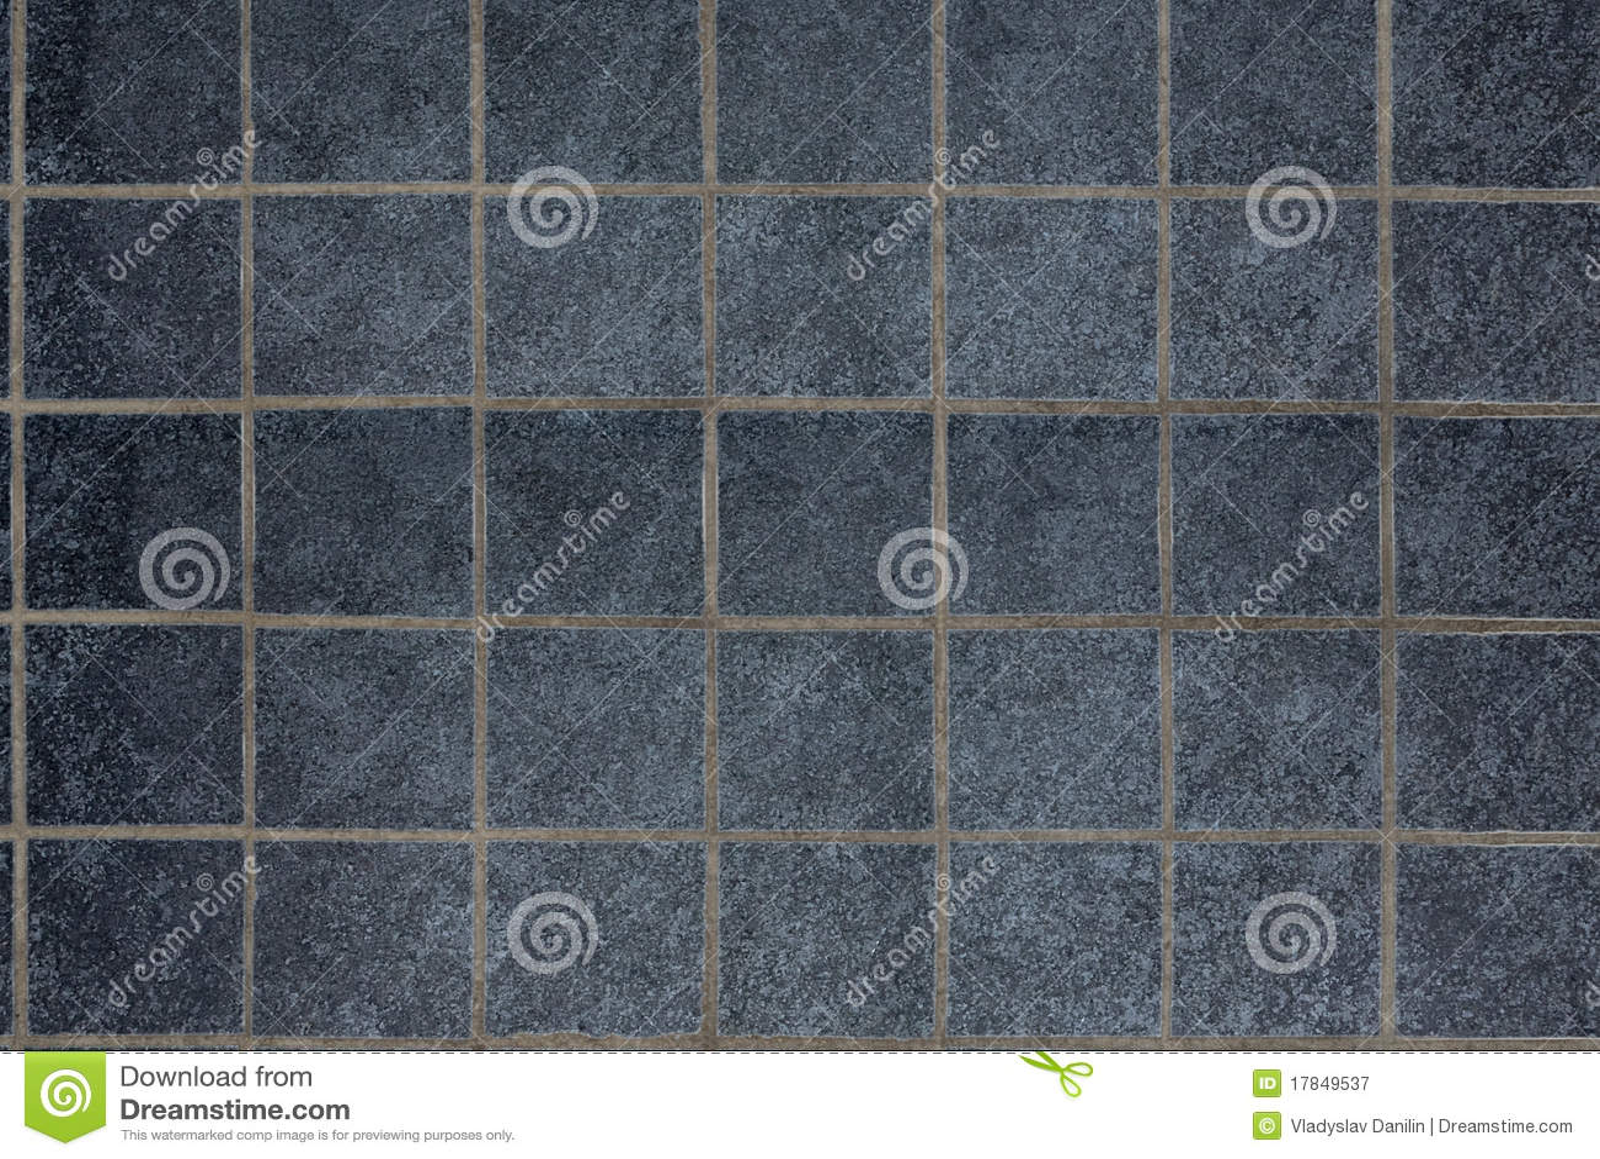 Azulejo negro fotograf a de archivo libre de regal as - Azulejo negro ...